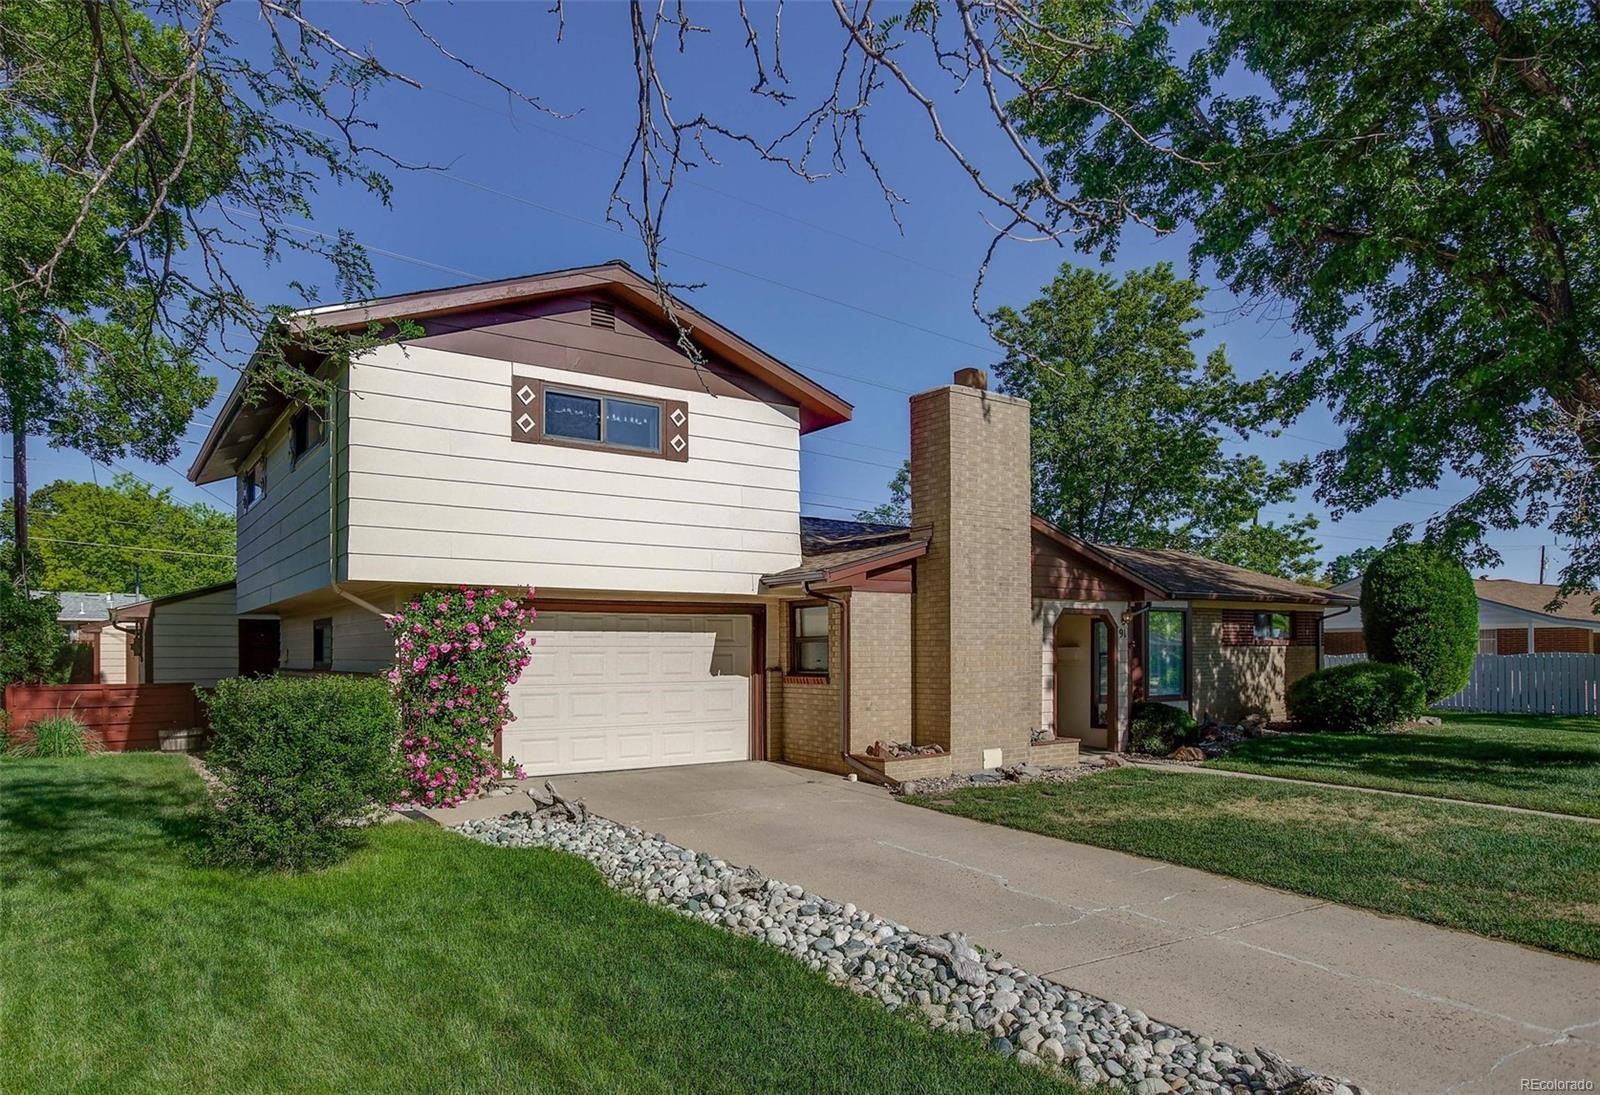 91 South Eaton Court, Lakewood, CO | MLS# 3264606 | Ron